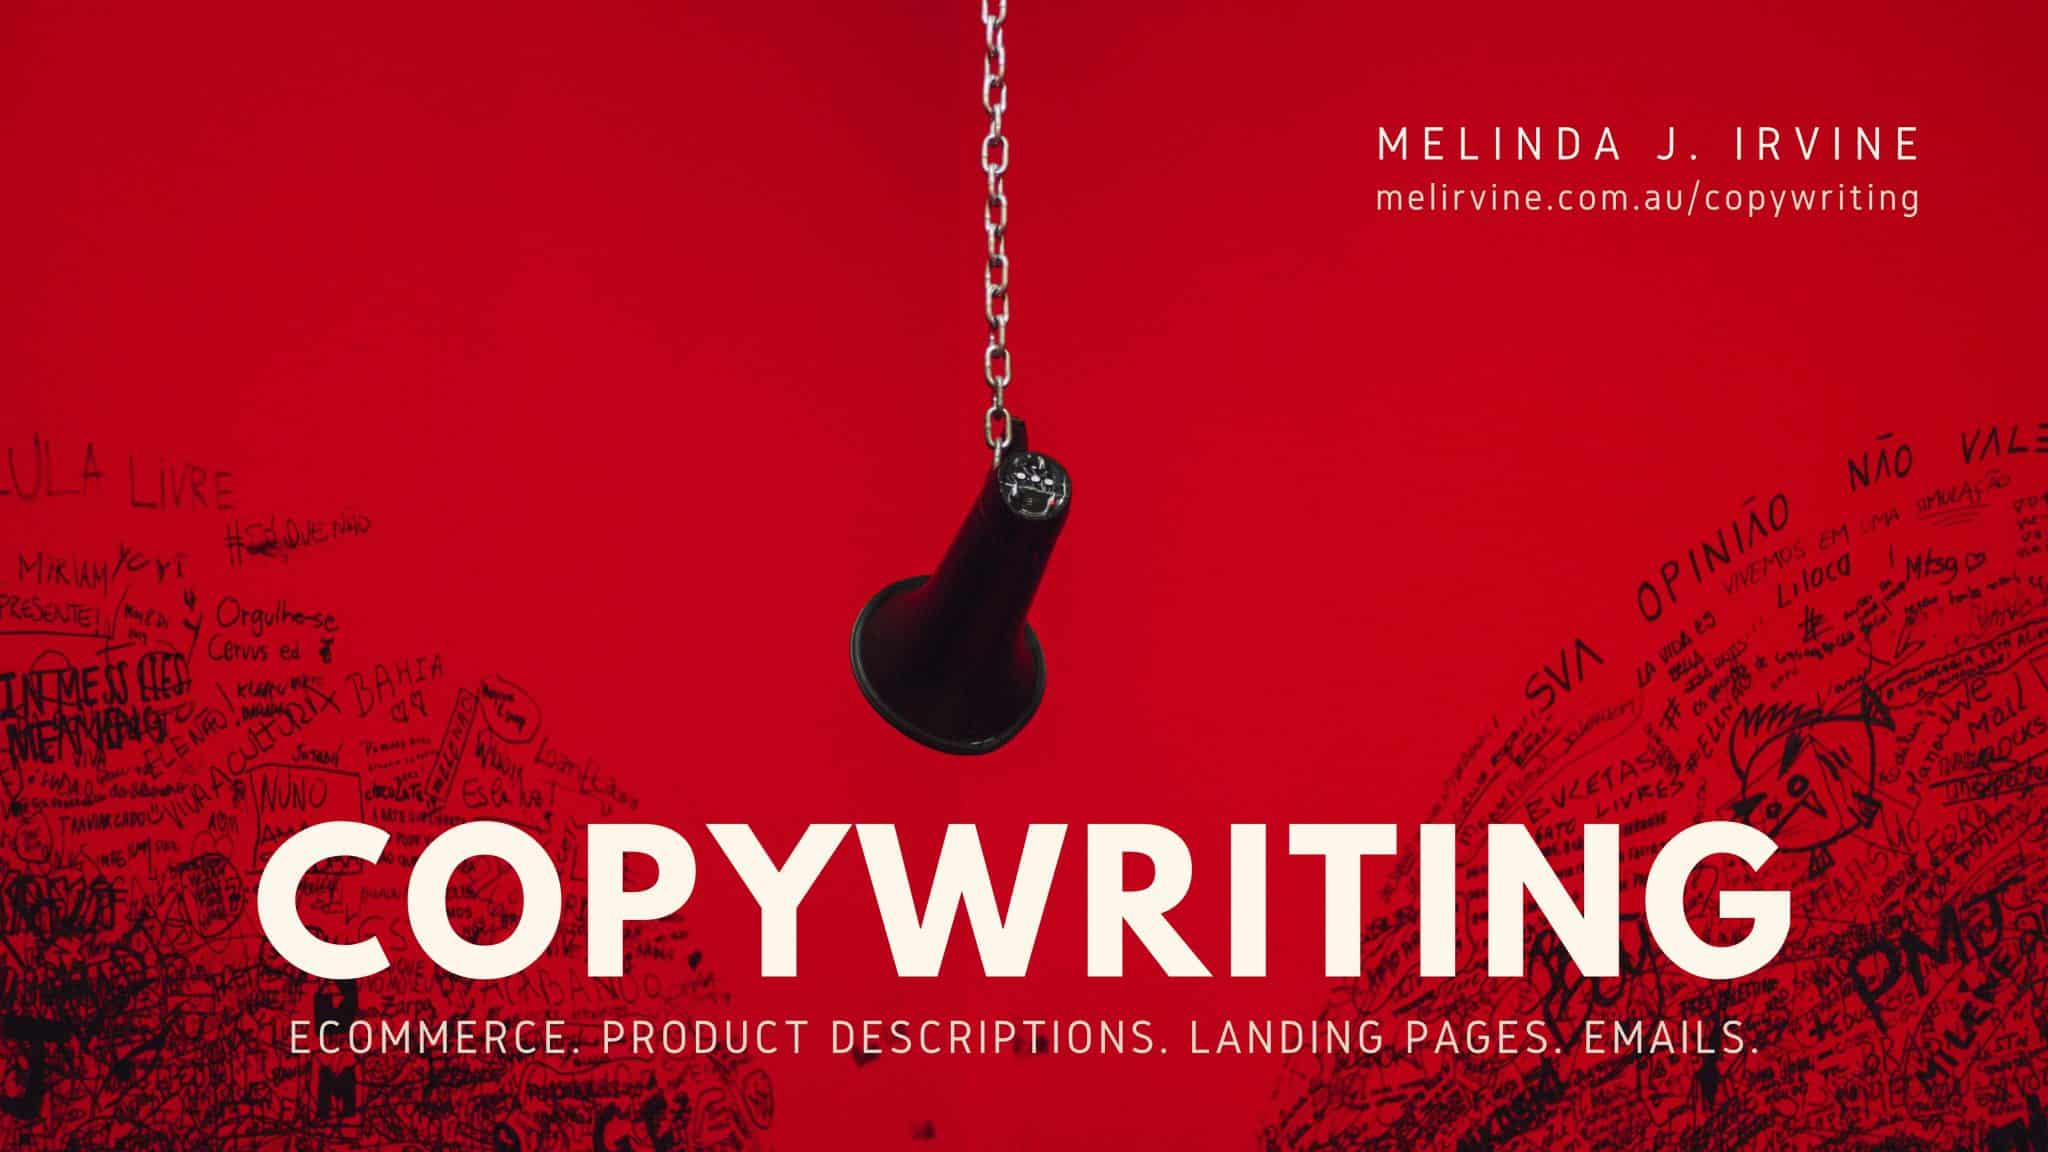 COPYWRITING SERVICE @ Melinda J. Irvine